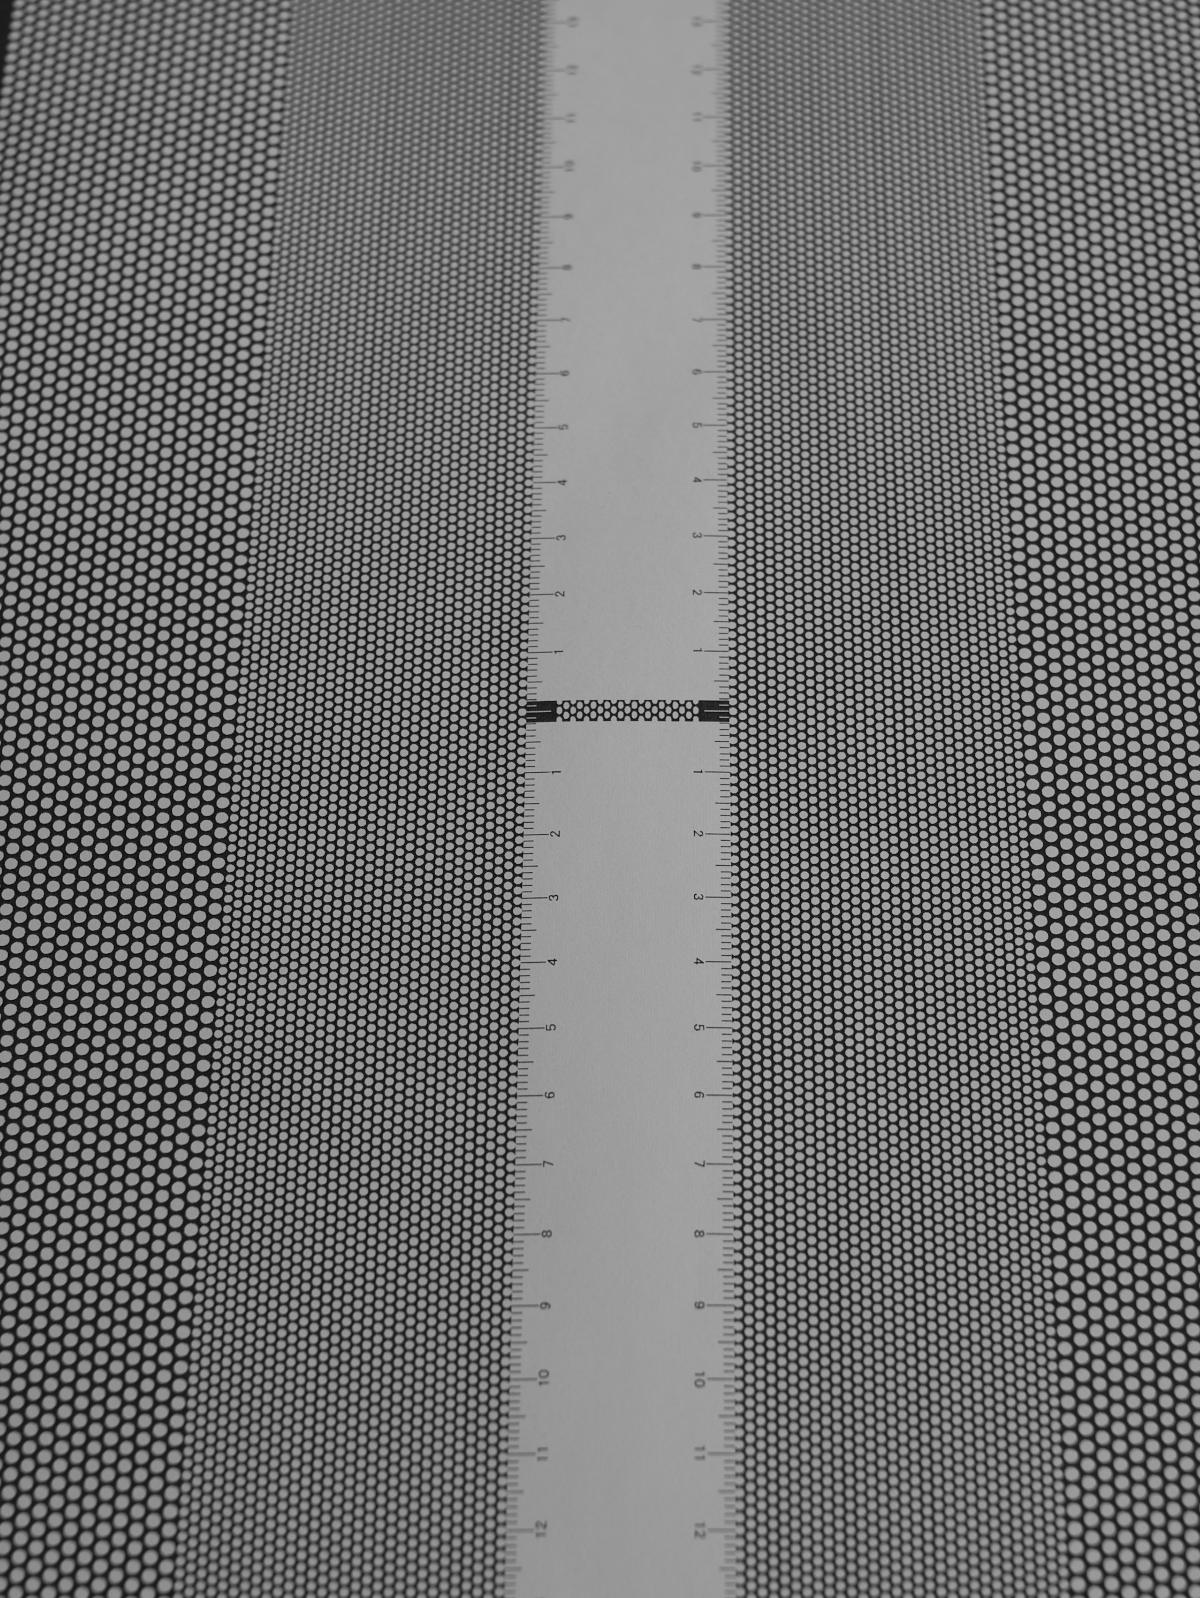 Flektogon 35mm F2.4 (後期型) レンズ性能_b0161171_18254255.jpg